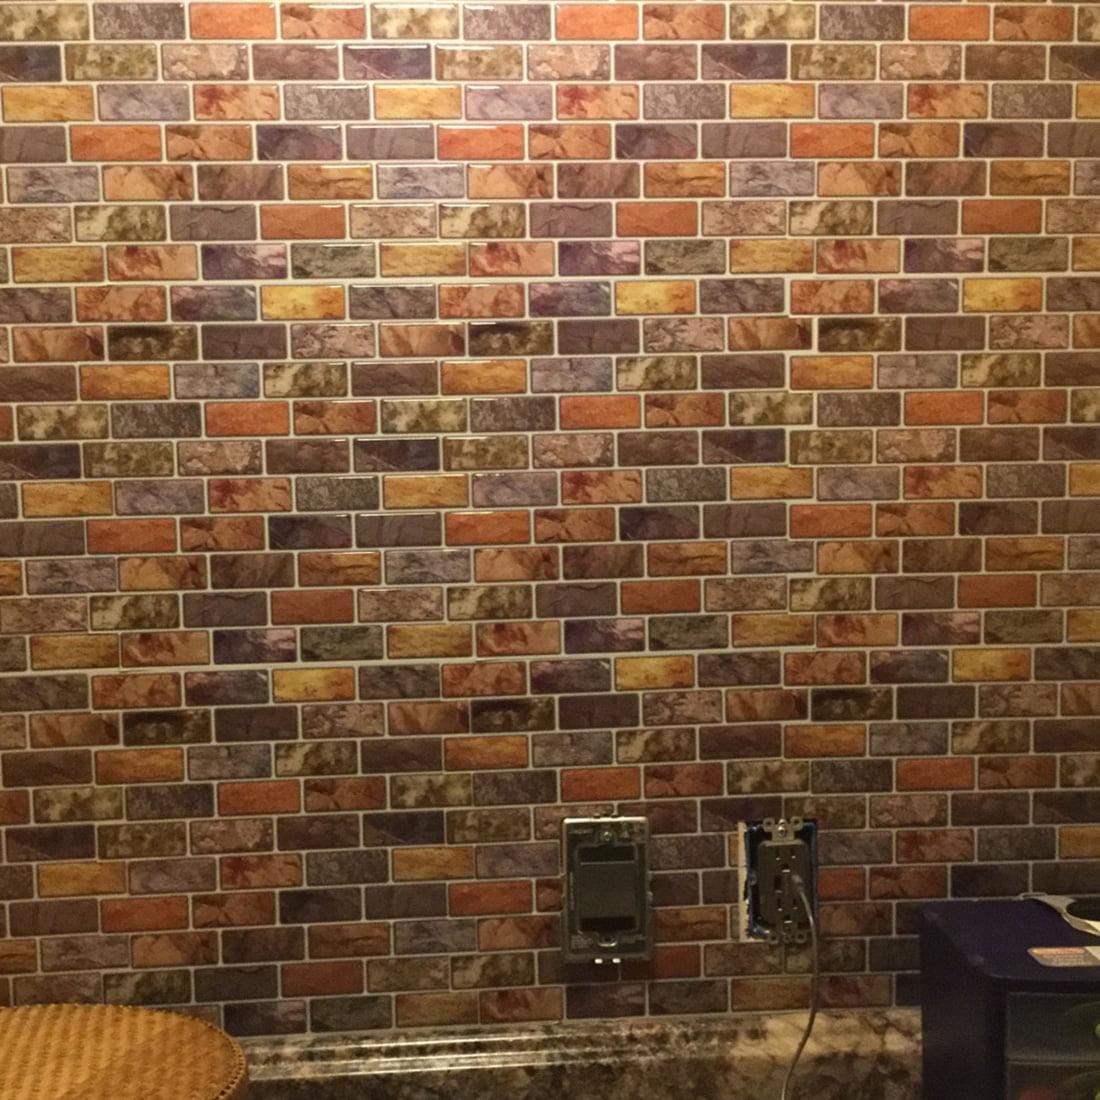 Art3d 12 X 12 Peel And Stick Backsplash Tiles For Kitchen Backsplash Bathroom Backsplash Walmart Com Walmart Com